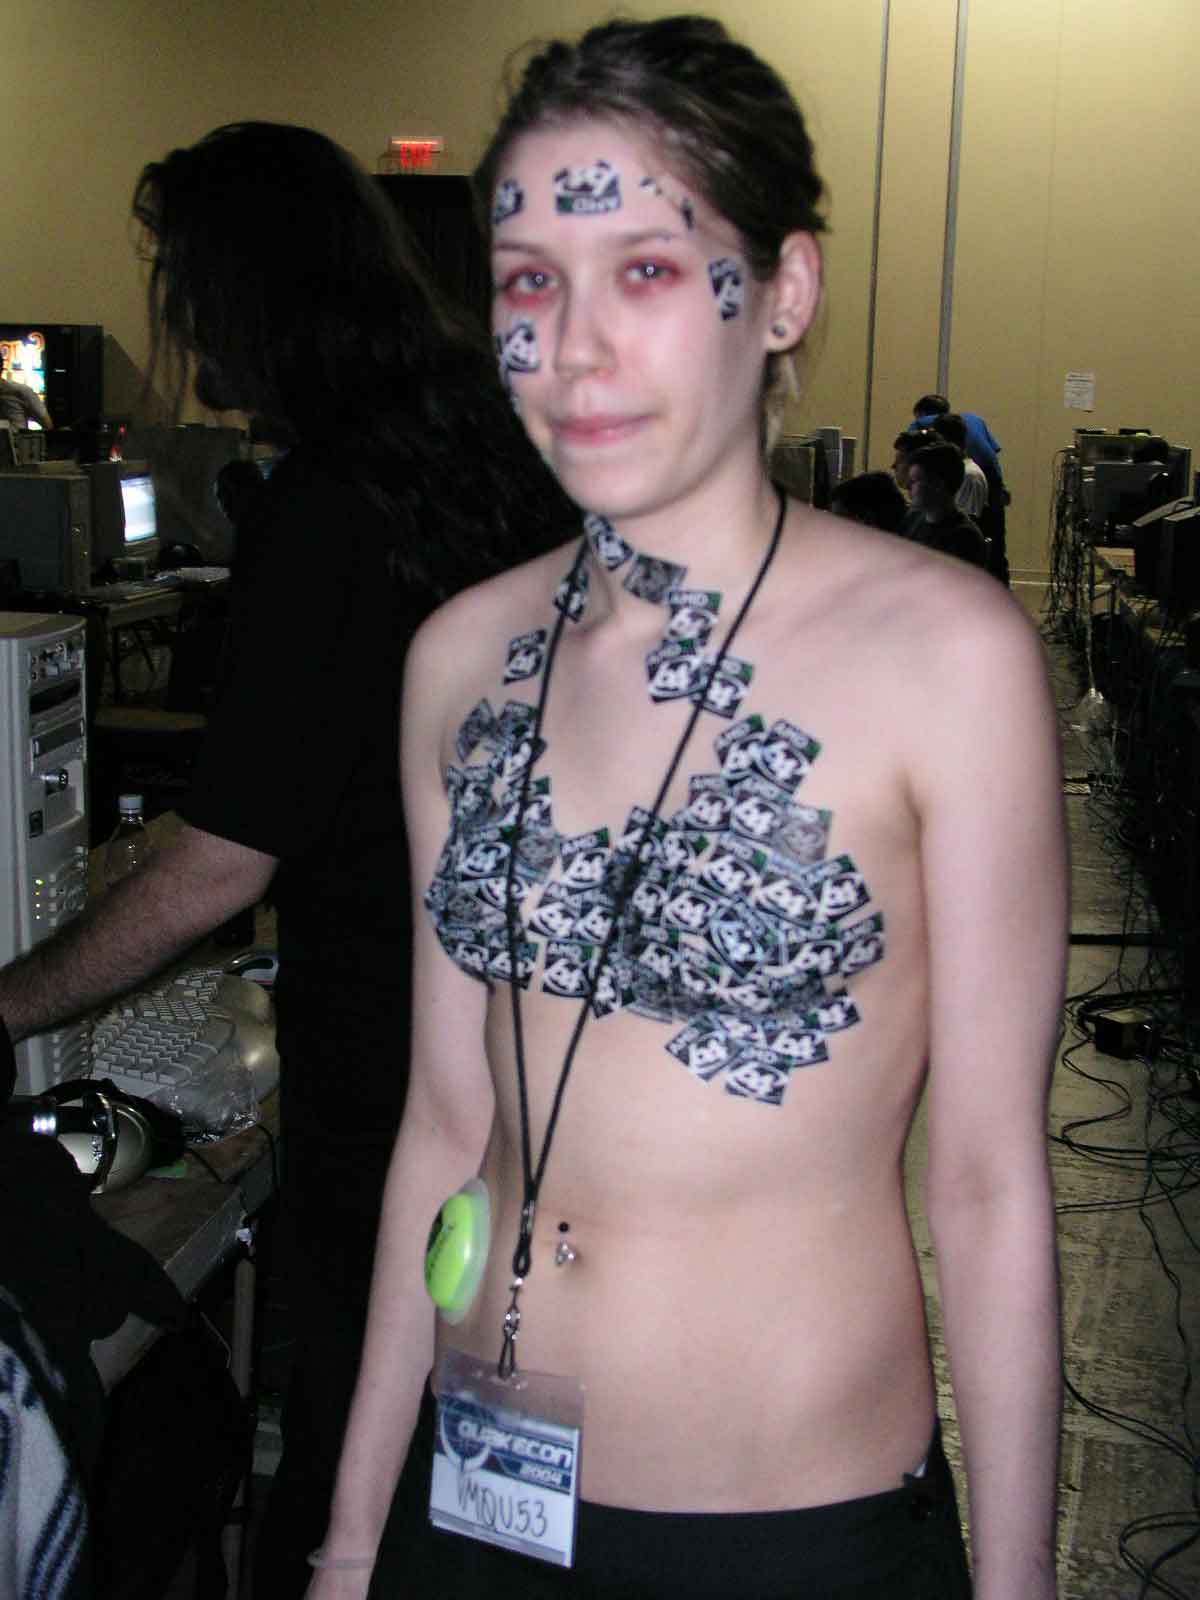 tattoos Girl breast